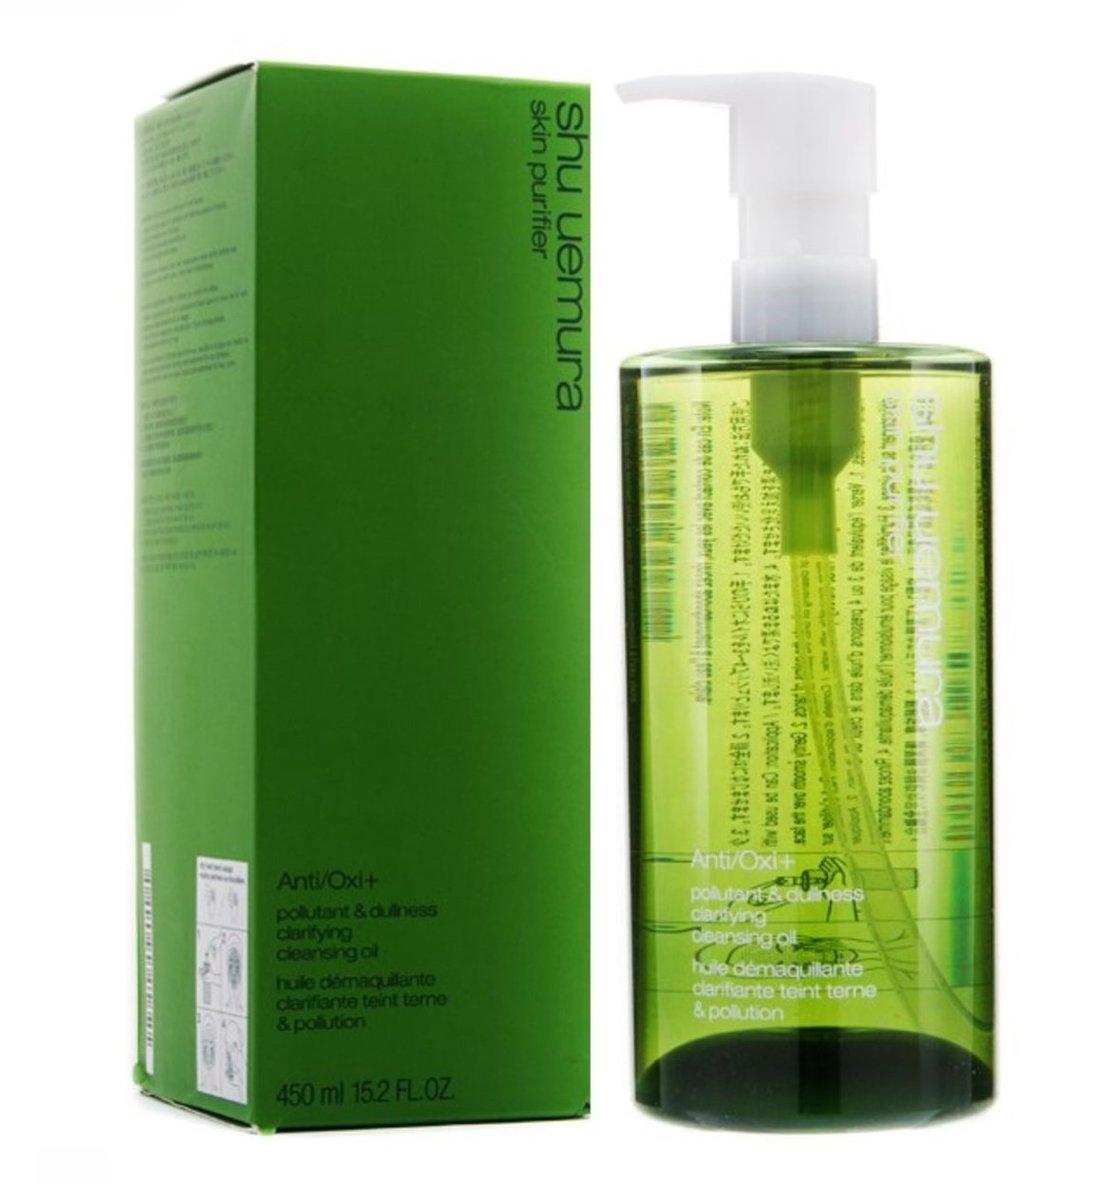 Anti/Oxi+昇級綠茶抗氧化潔顏油 卸妝油 450ml